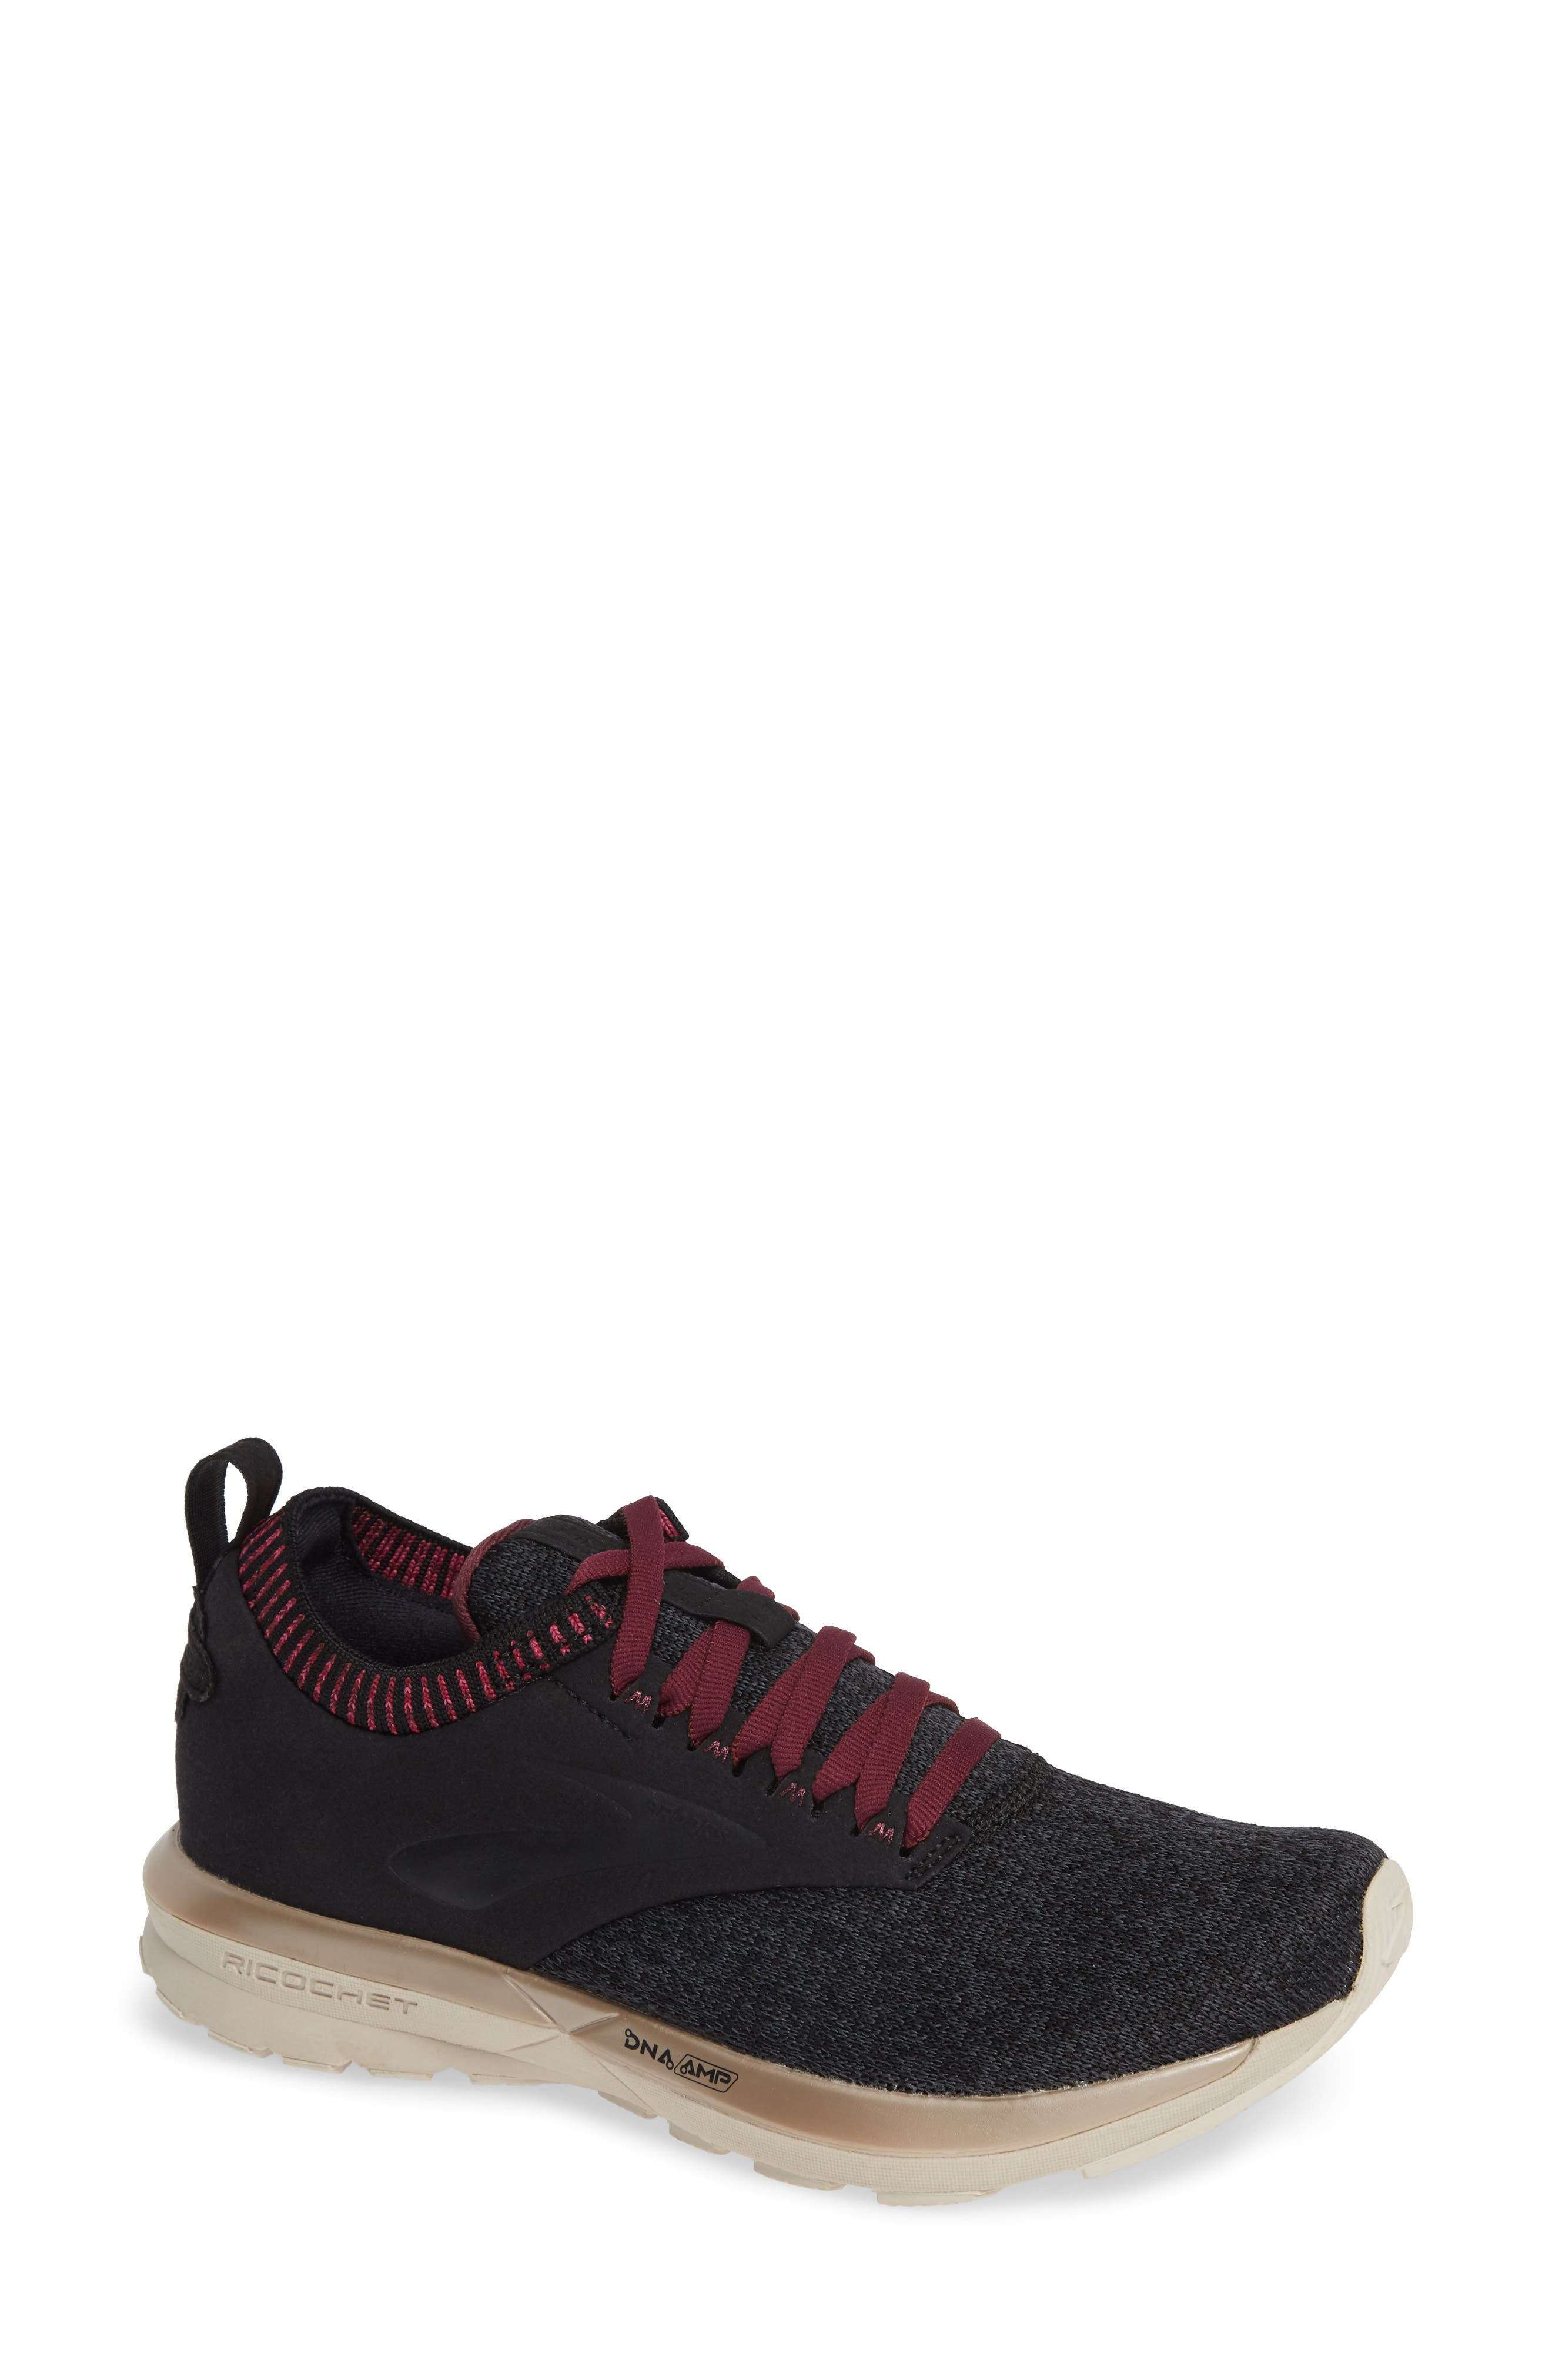 Ricochet LE Running Shoe,                             Main thumbnail 1, color,                             BLACK/ GREY/ PINK